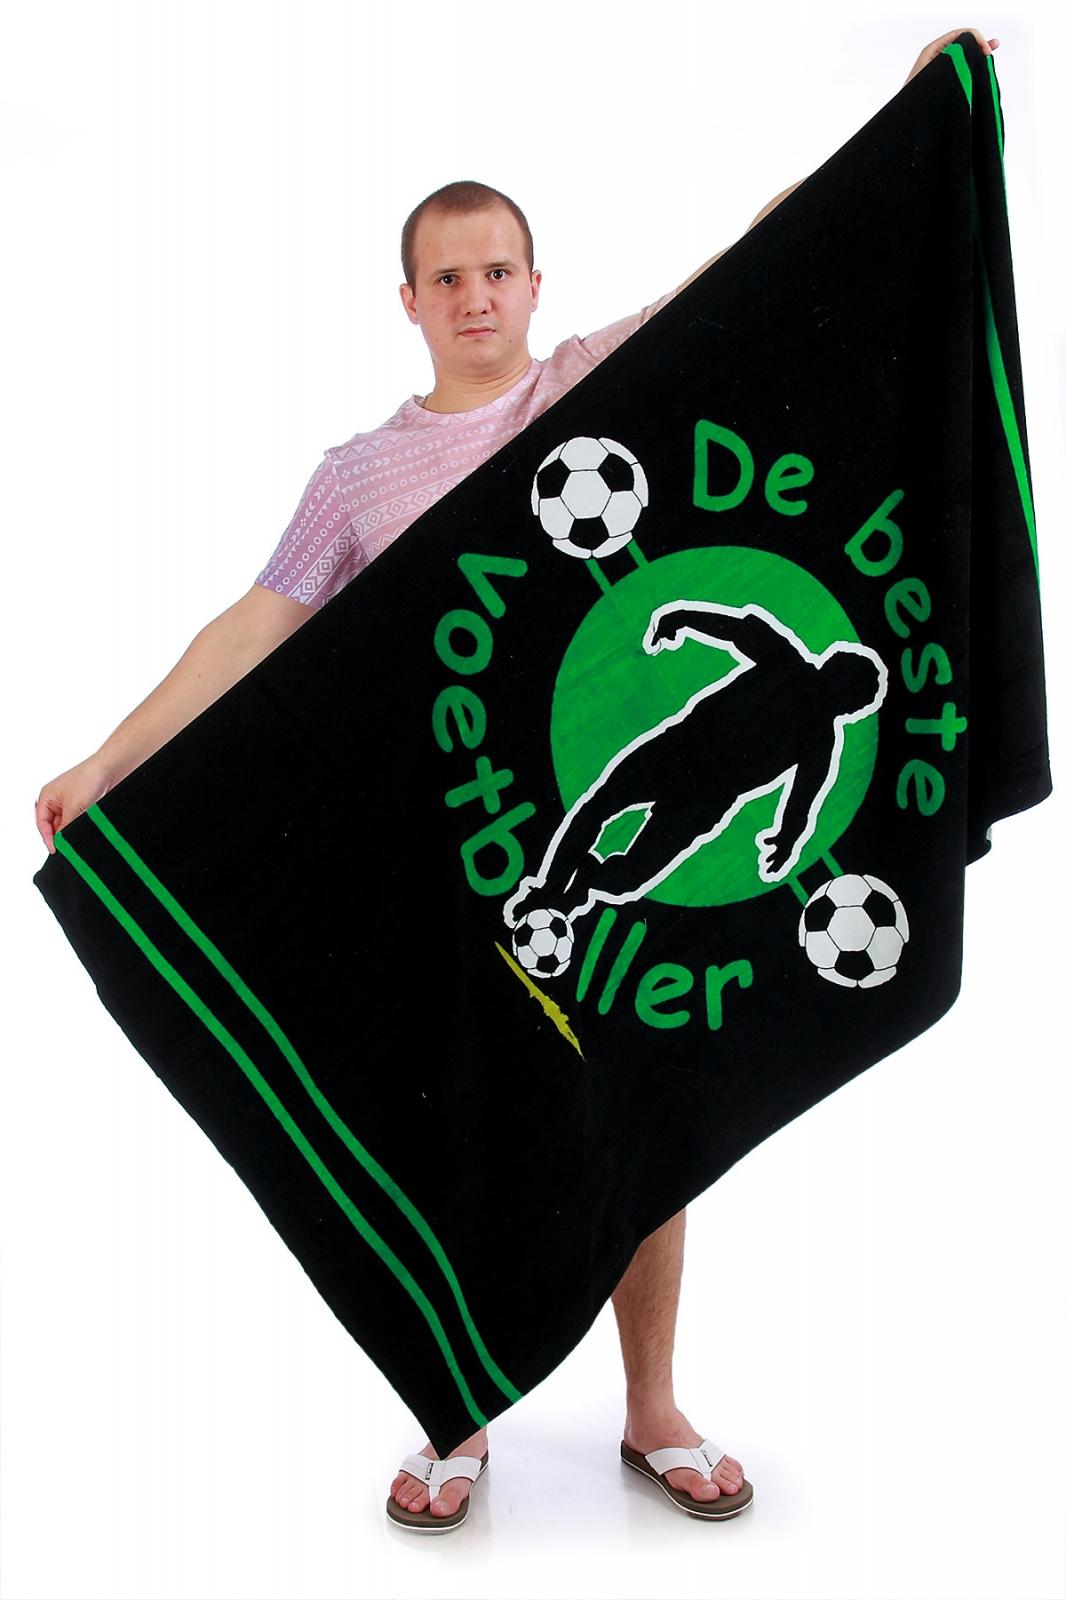 Полотенце спортивное - купить с доставкой онлайн